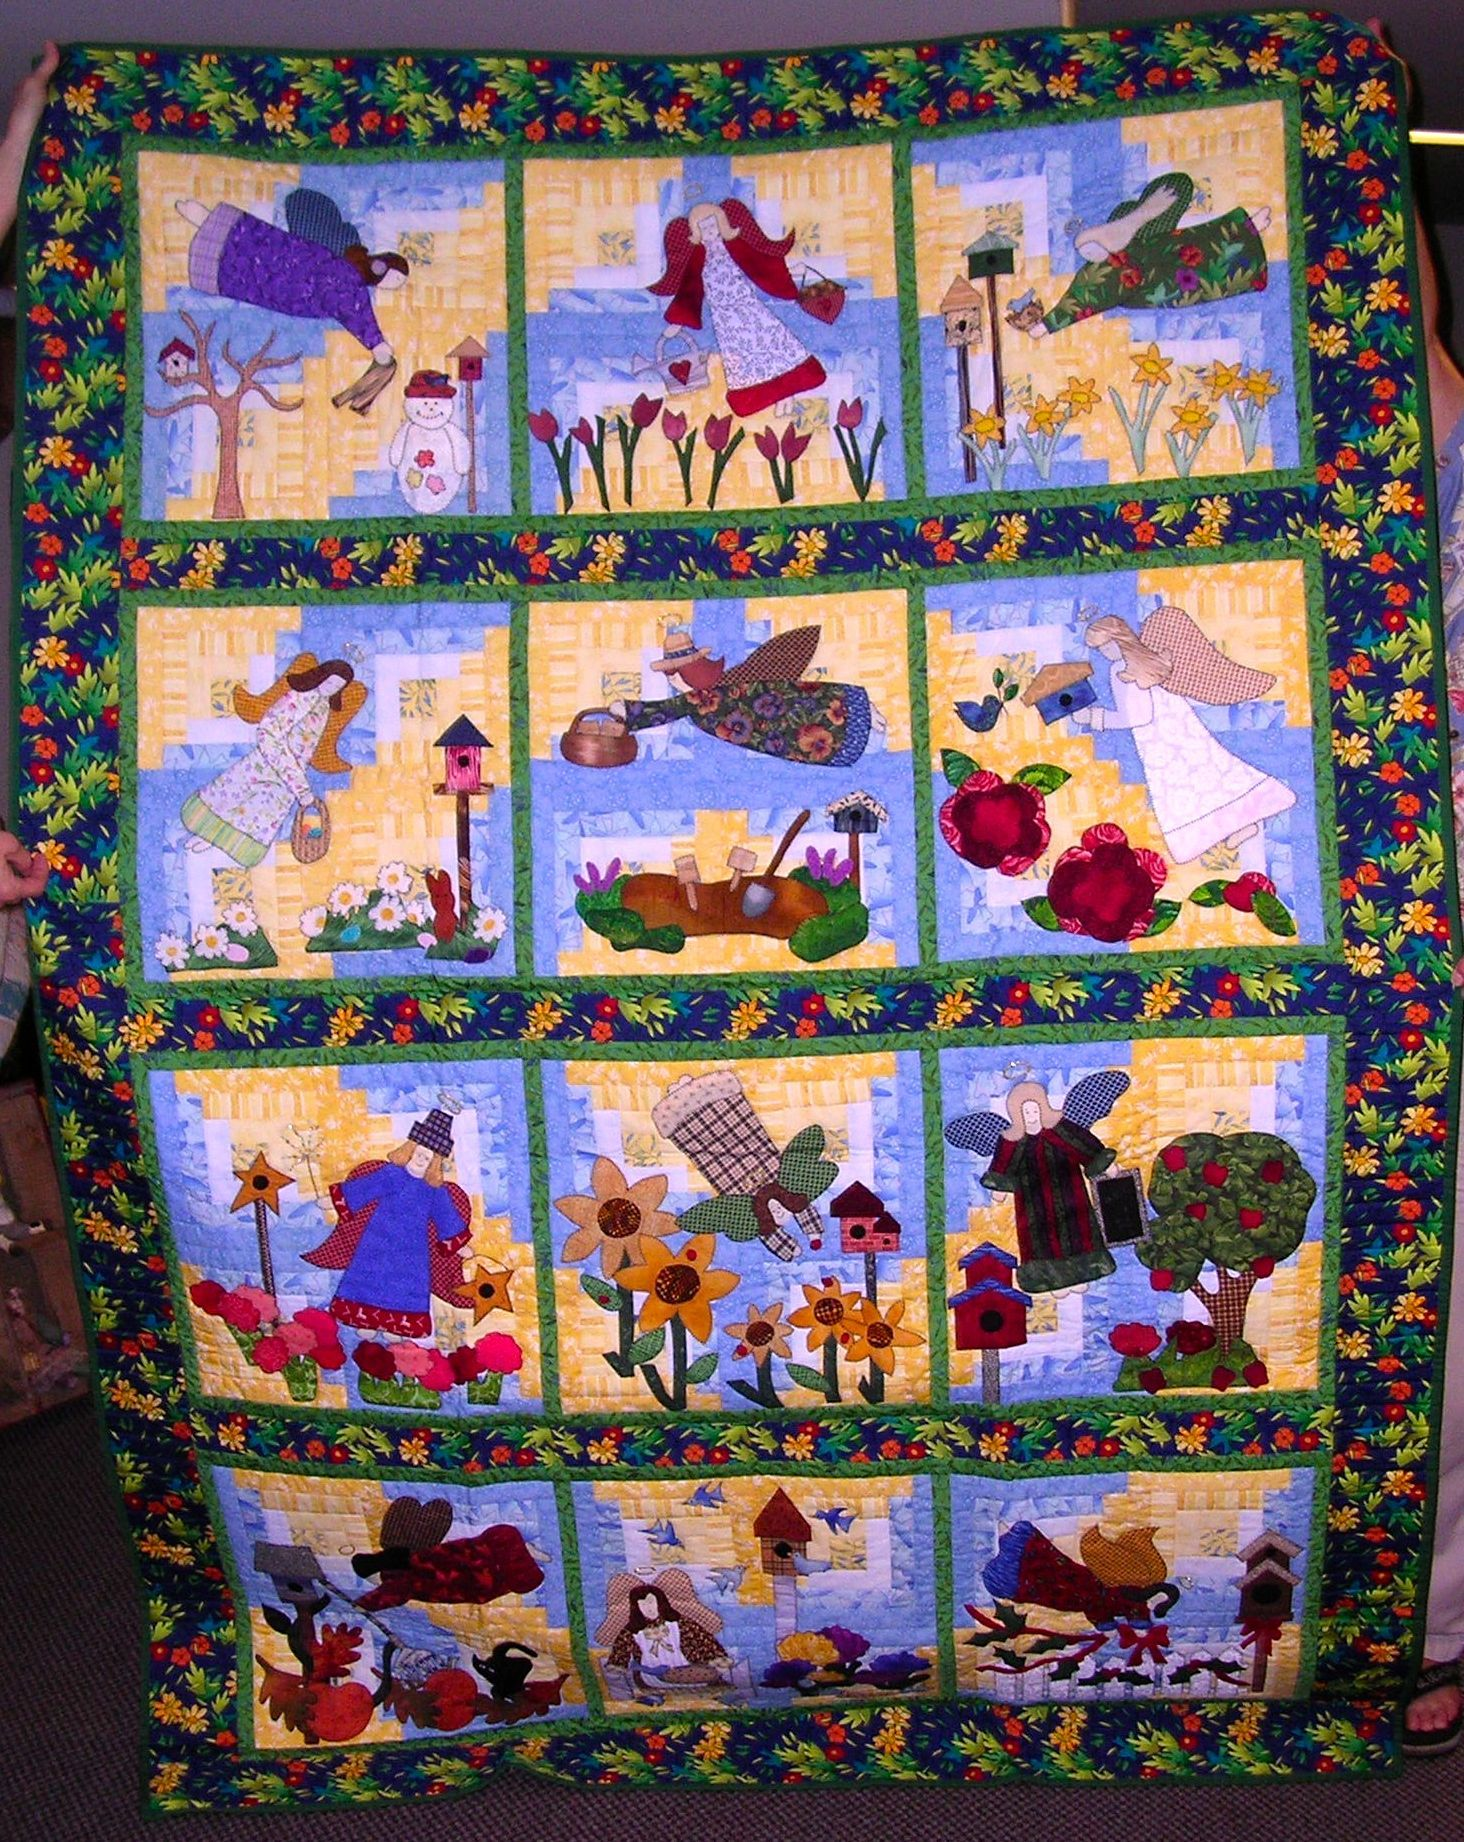 Monthly Calendar Quilt Patterns : Gardening angels was a block of the month calendar quilt